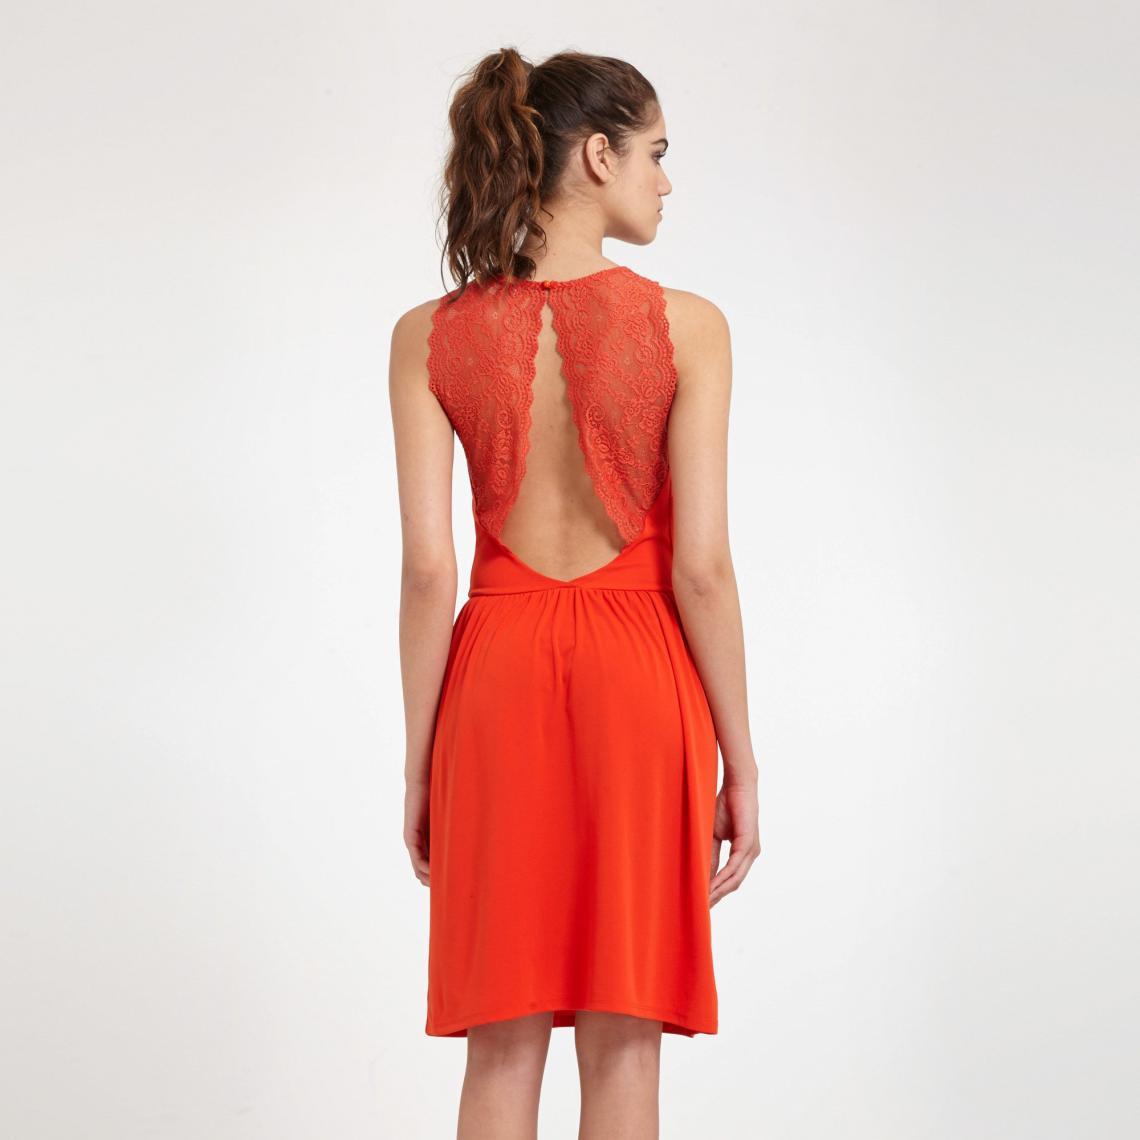 e06562bbd0a Robe courte femme Morgan - Orange